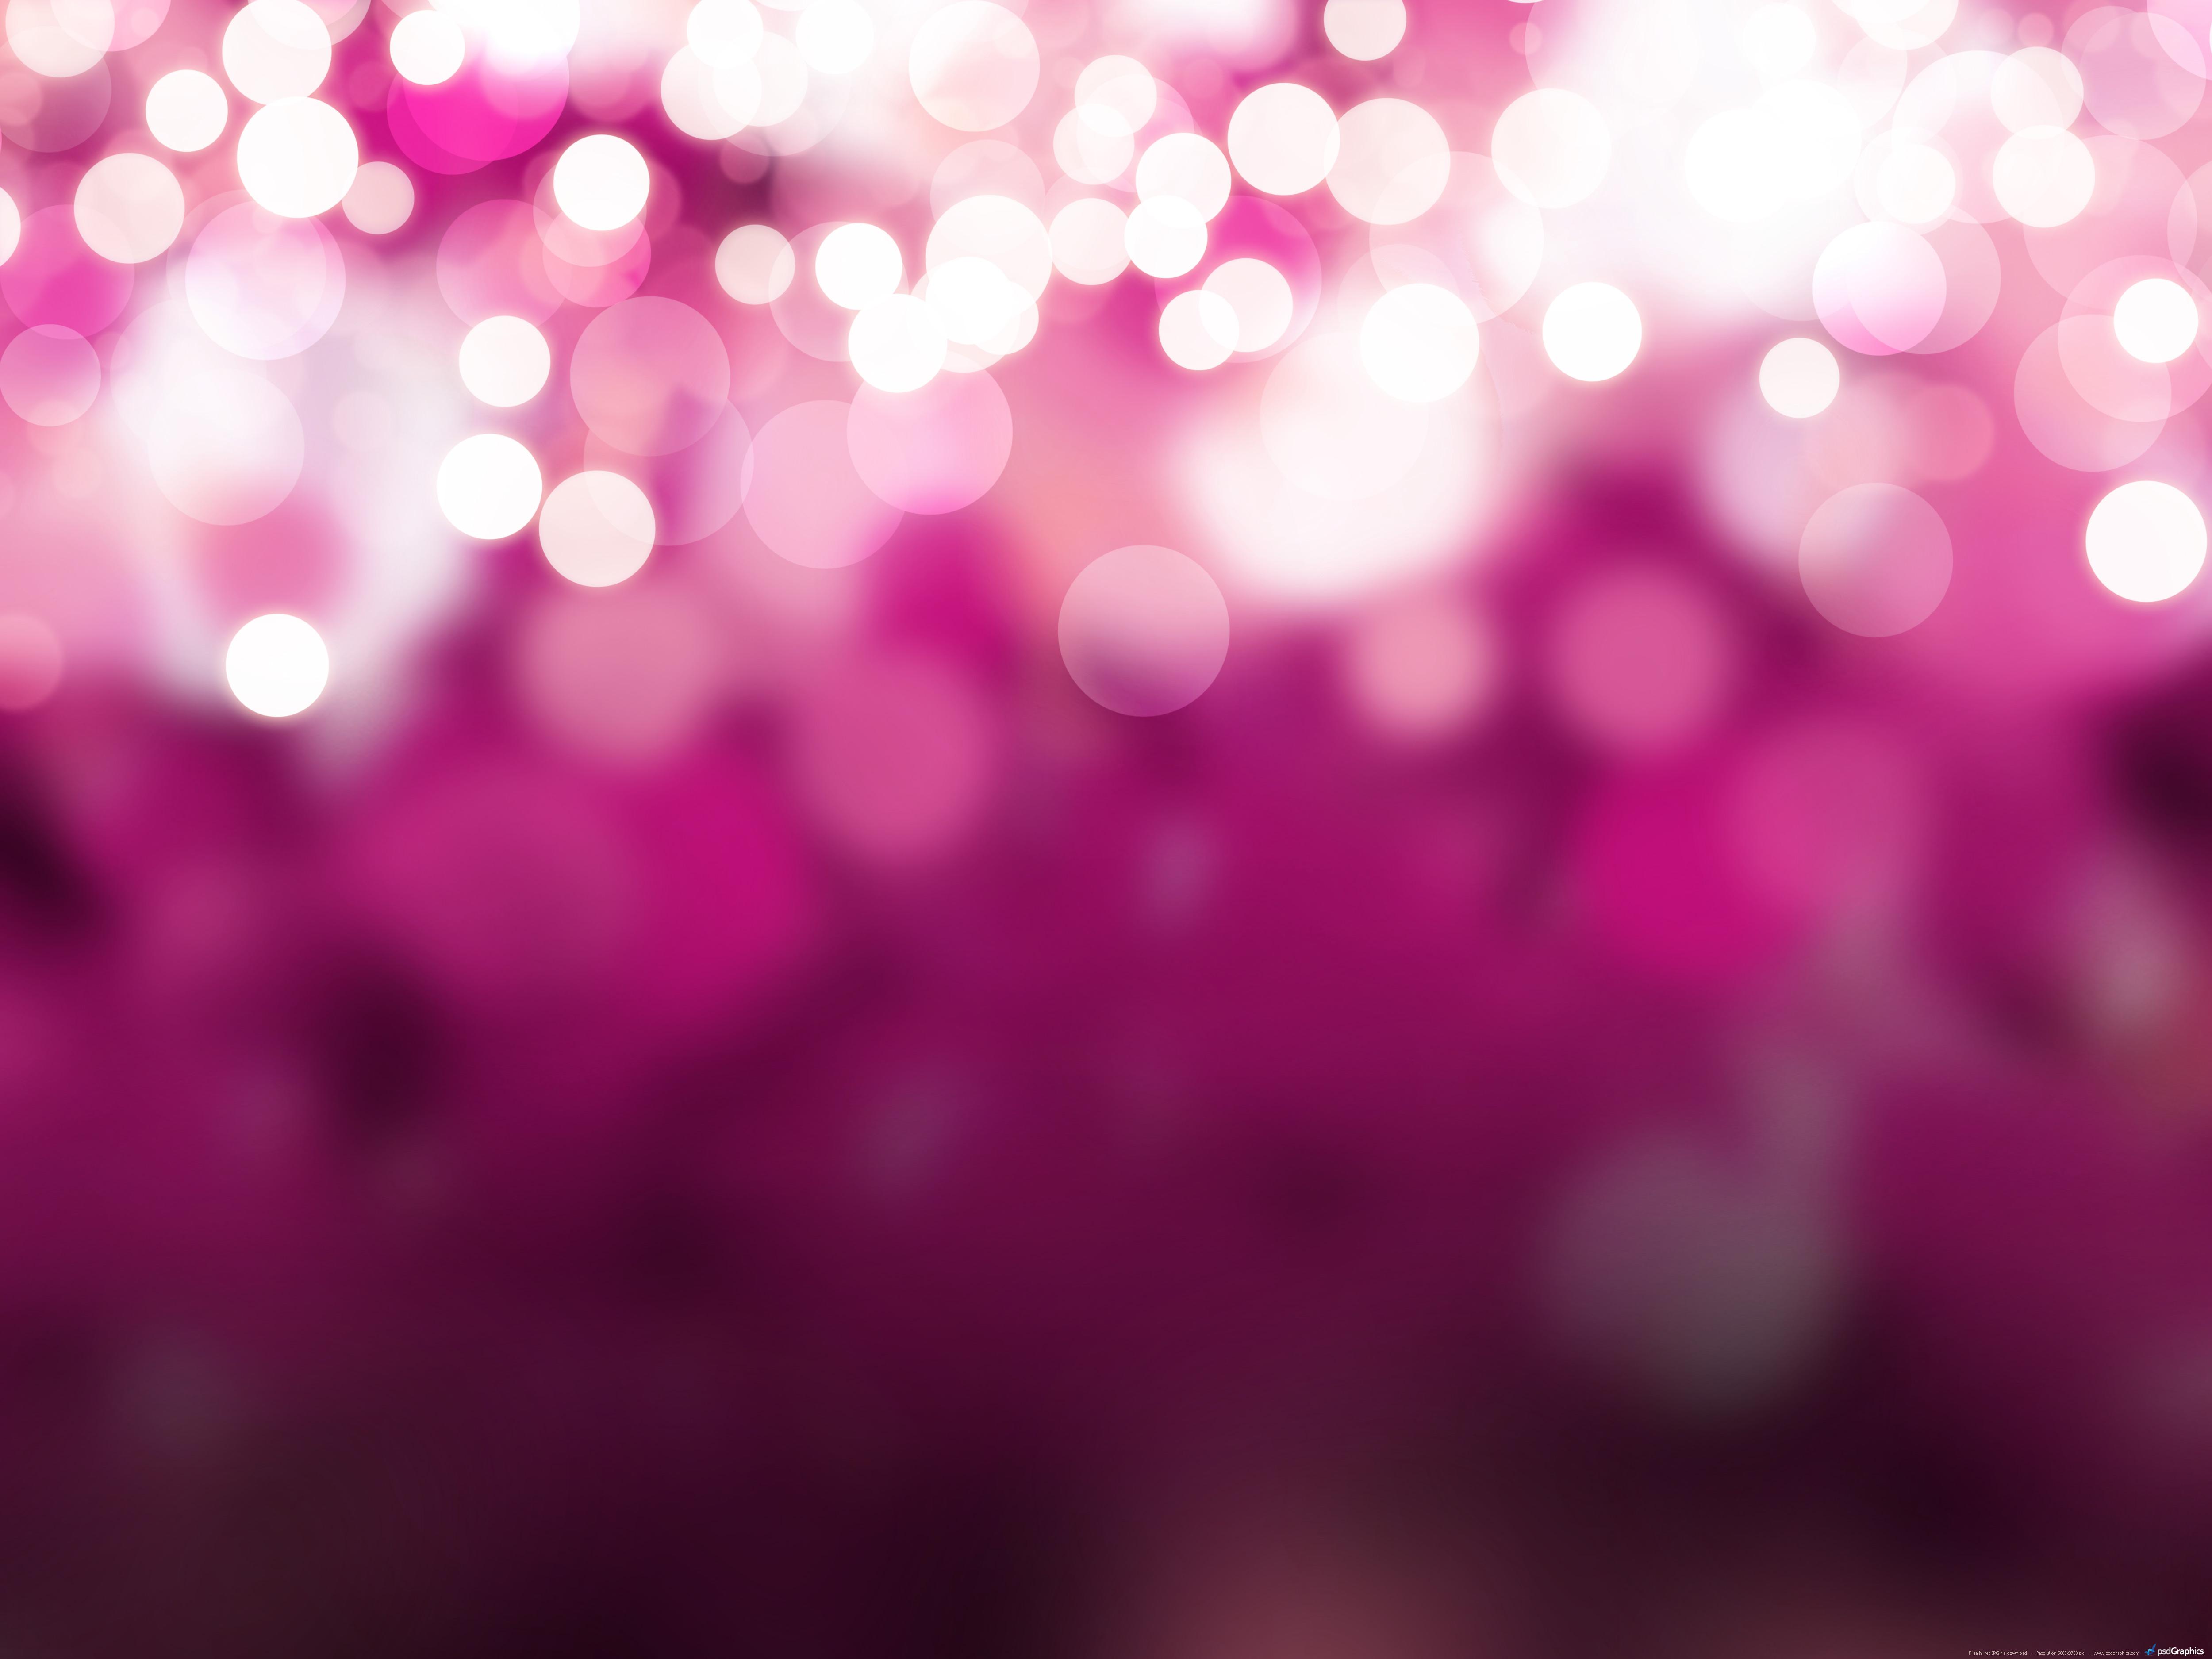 Blurry Christmas lights background PSDGraphics 5000x3750